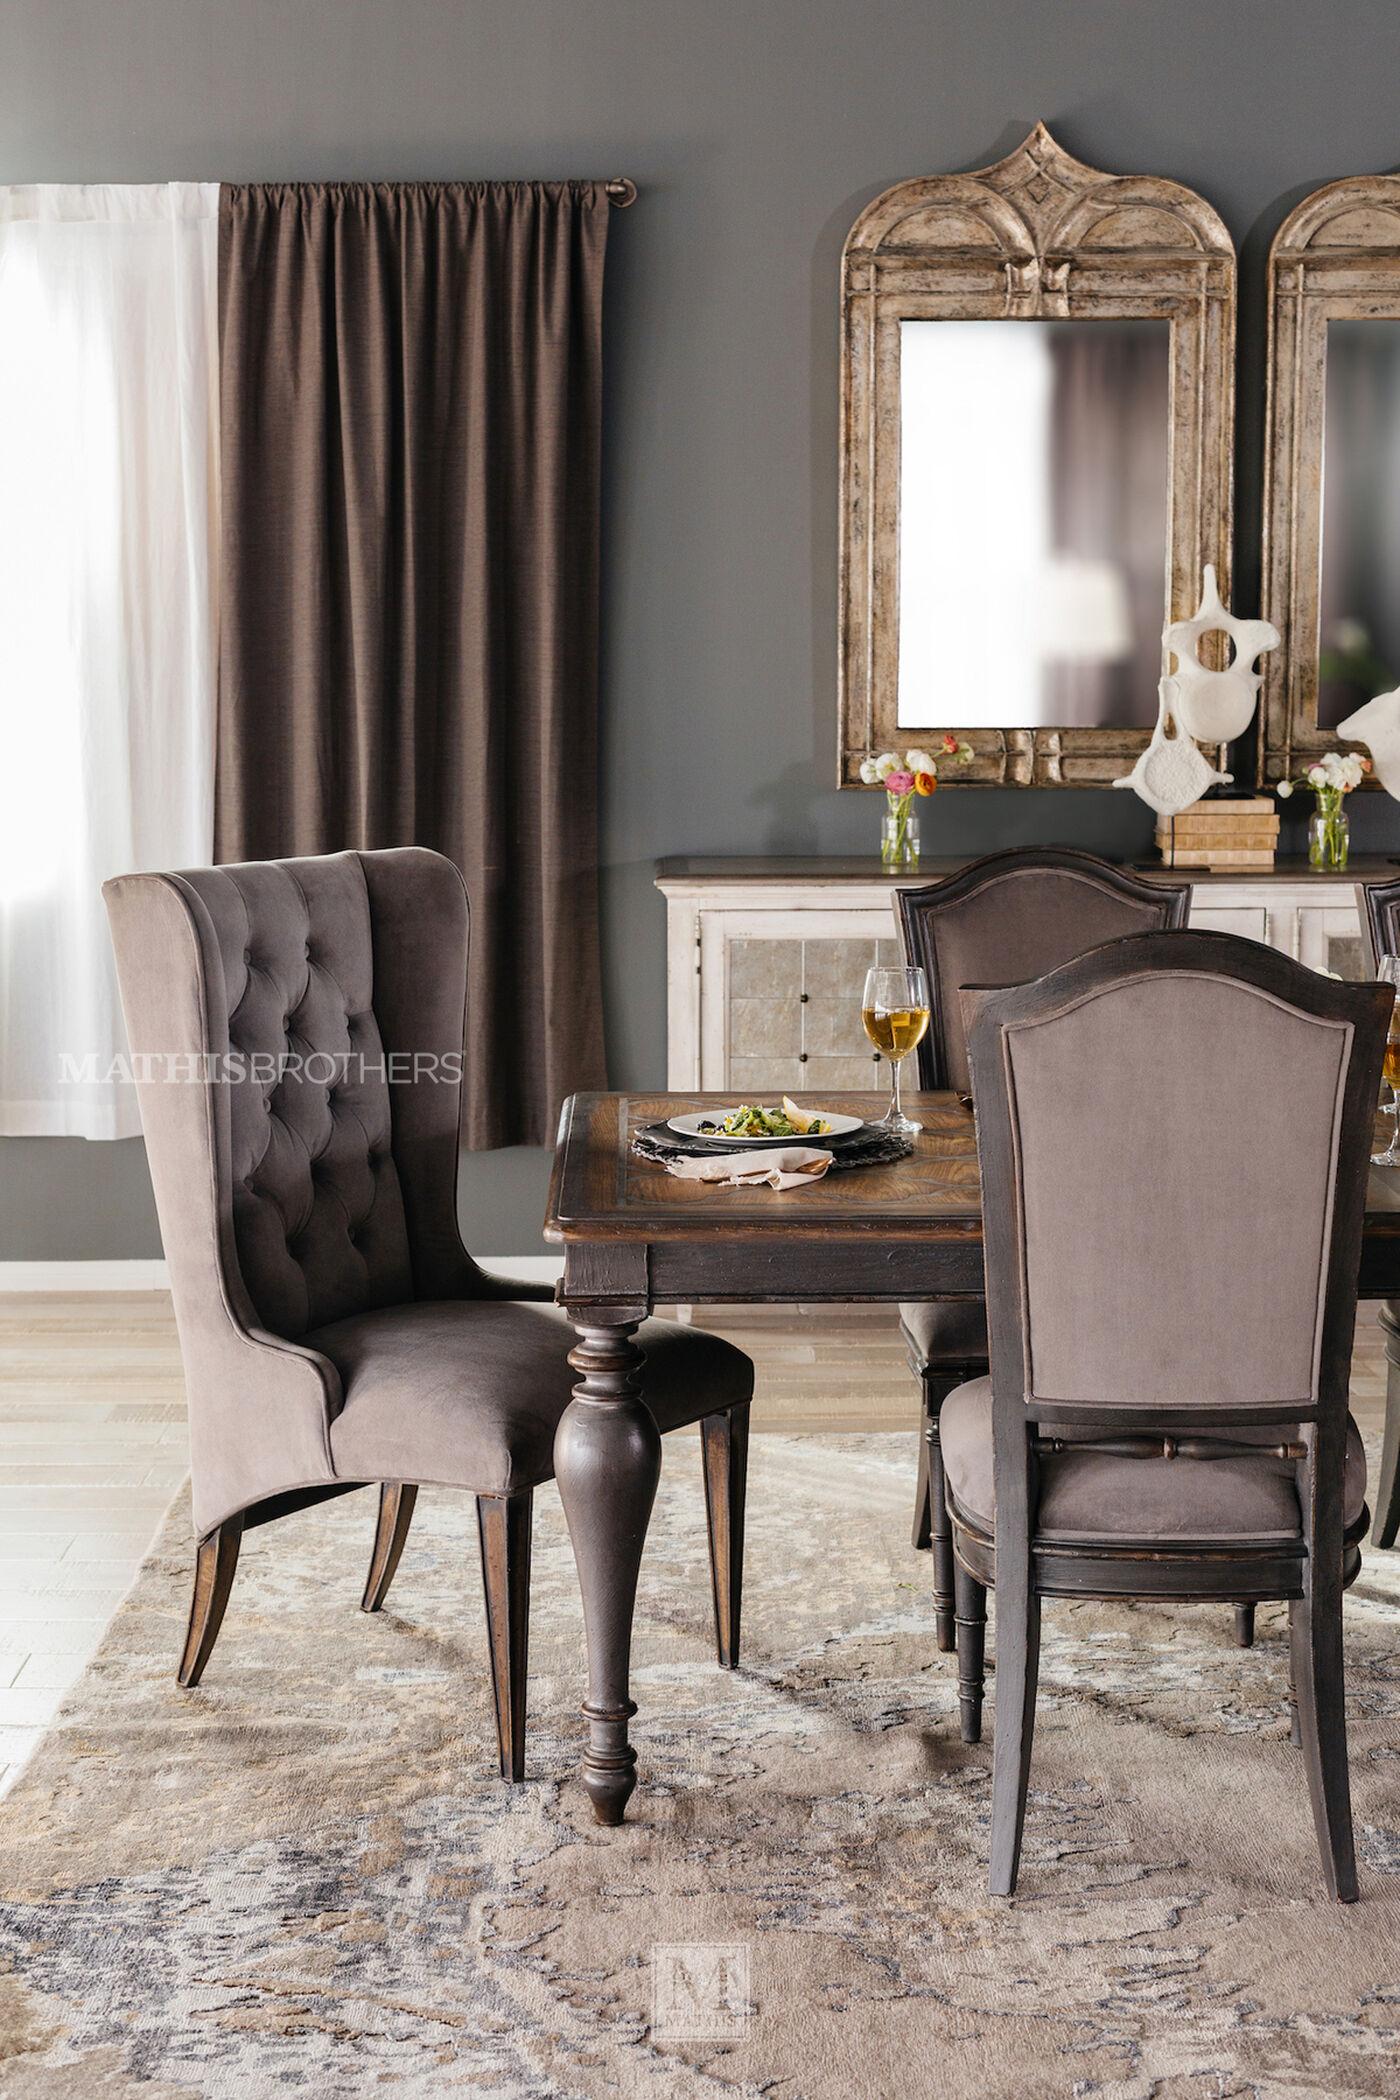 hooker arabella upholstered host chair | mathis brothers furniture